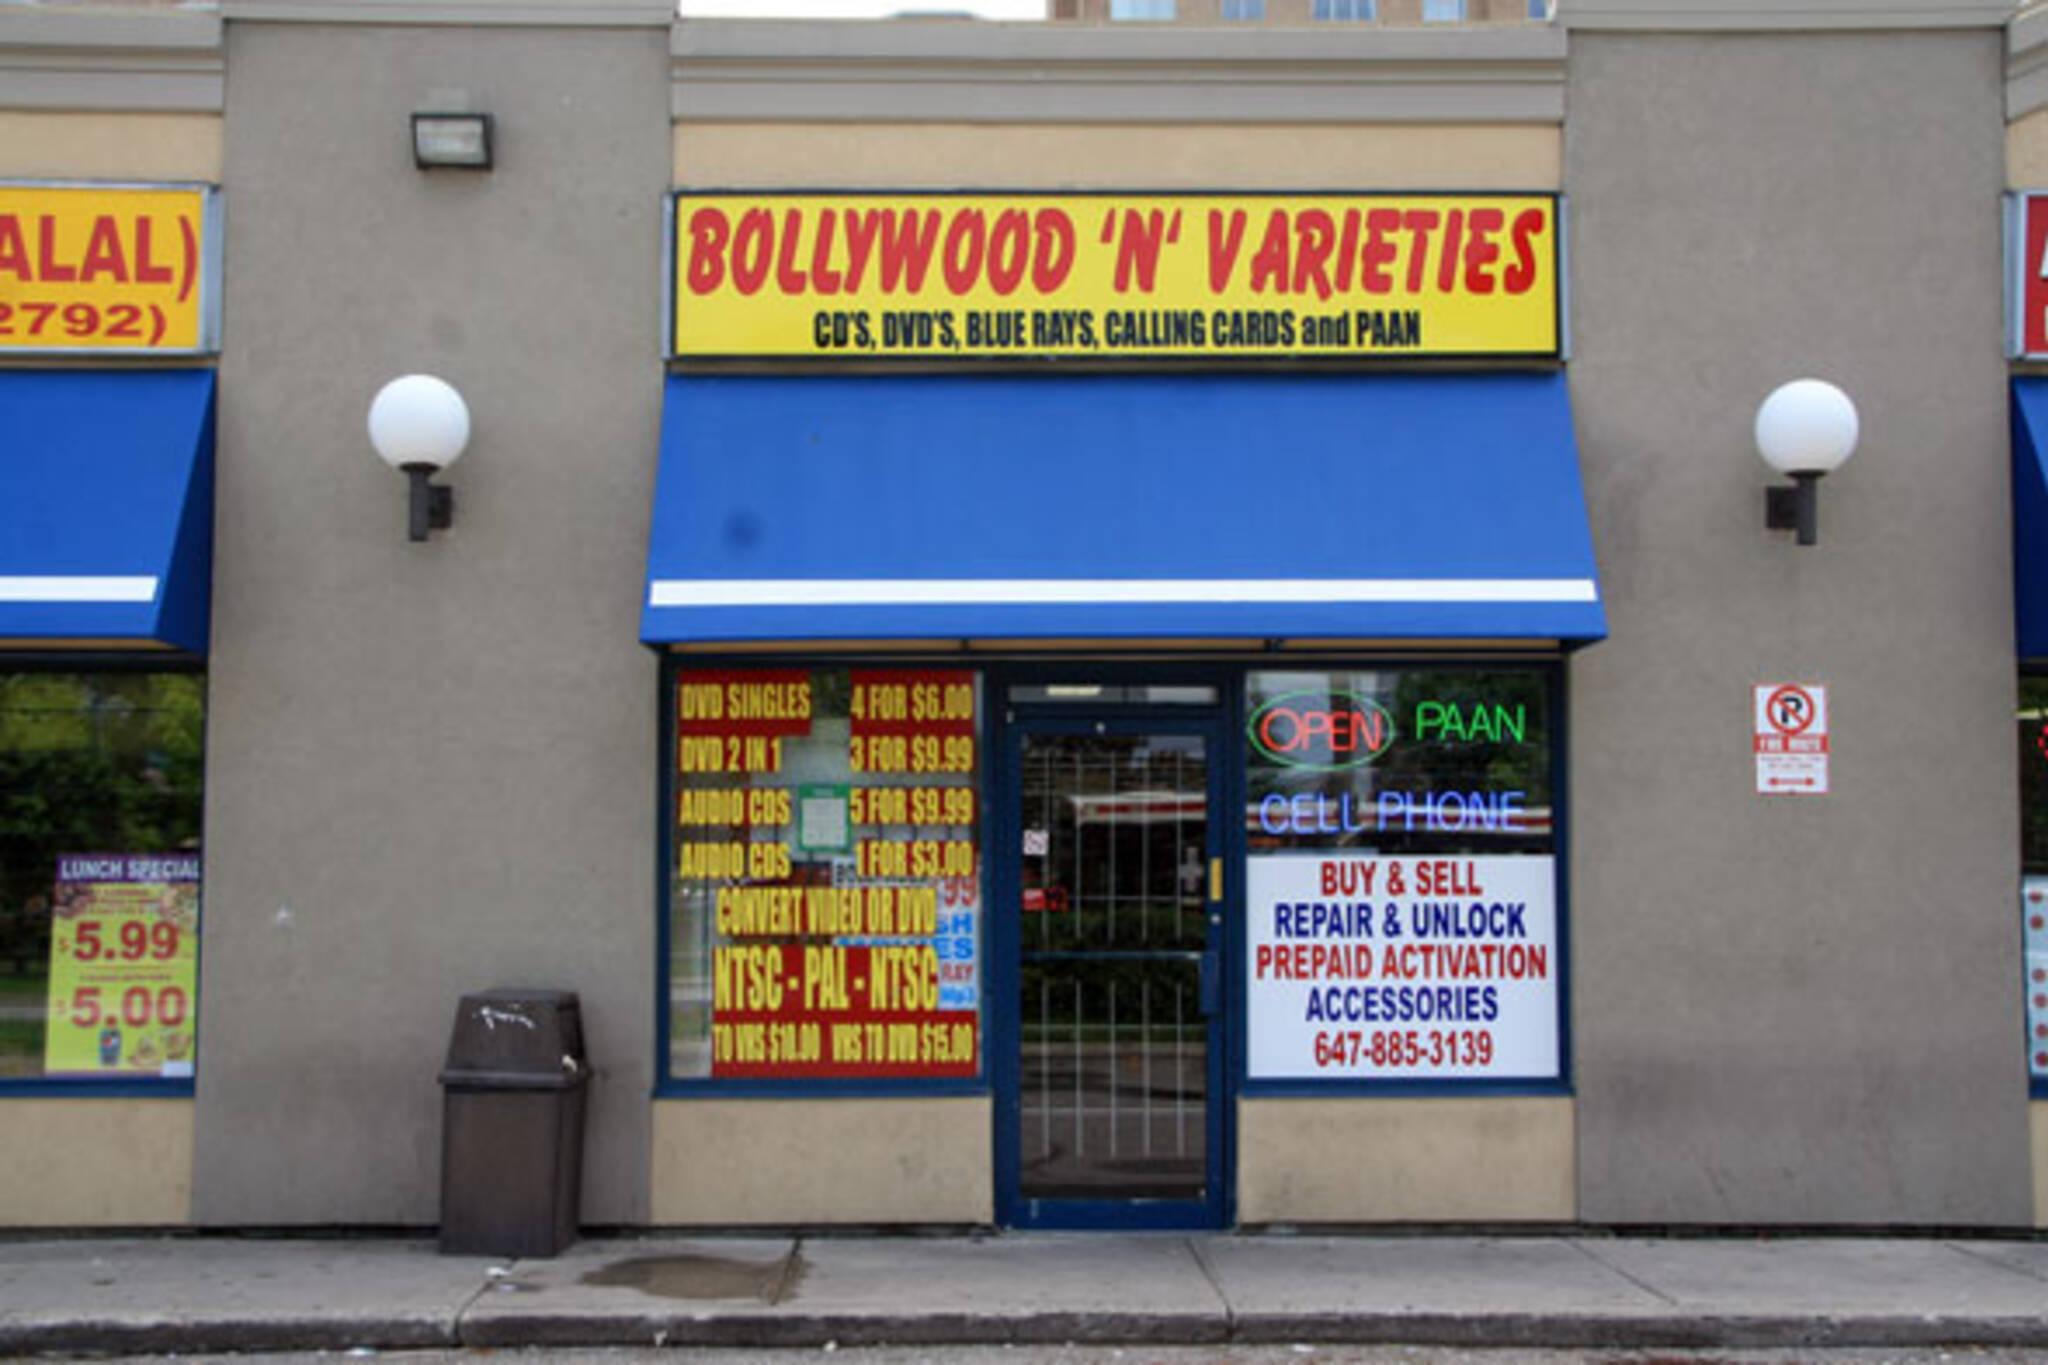 Bollywood Videos Toronto